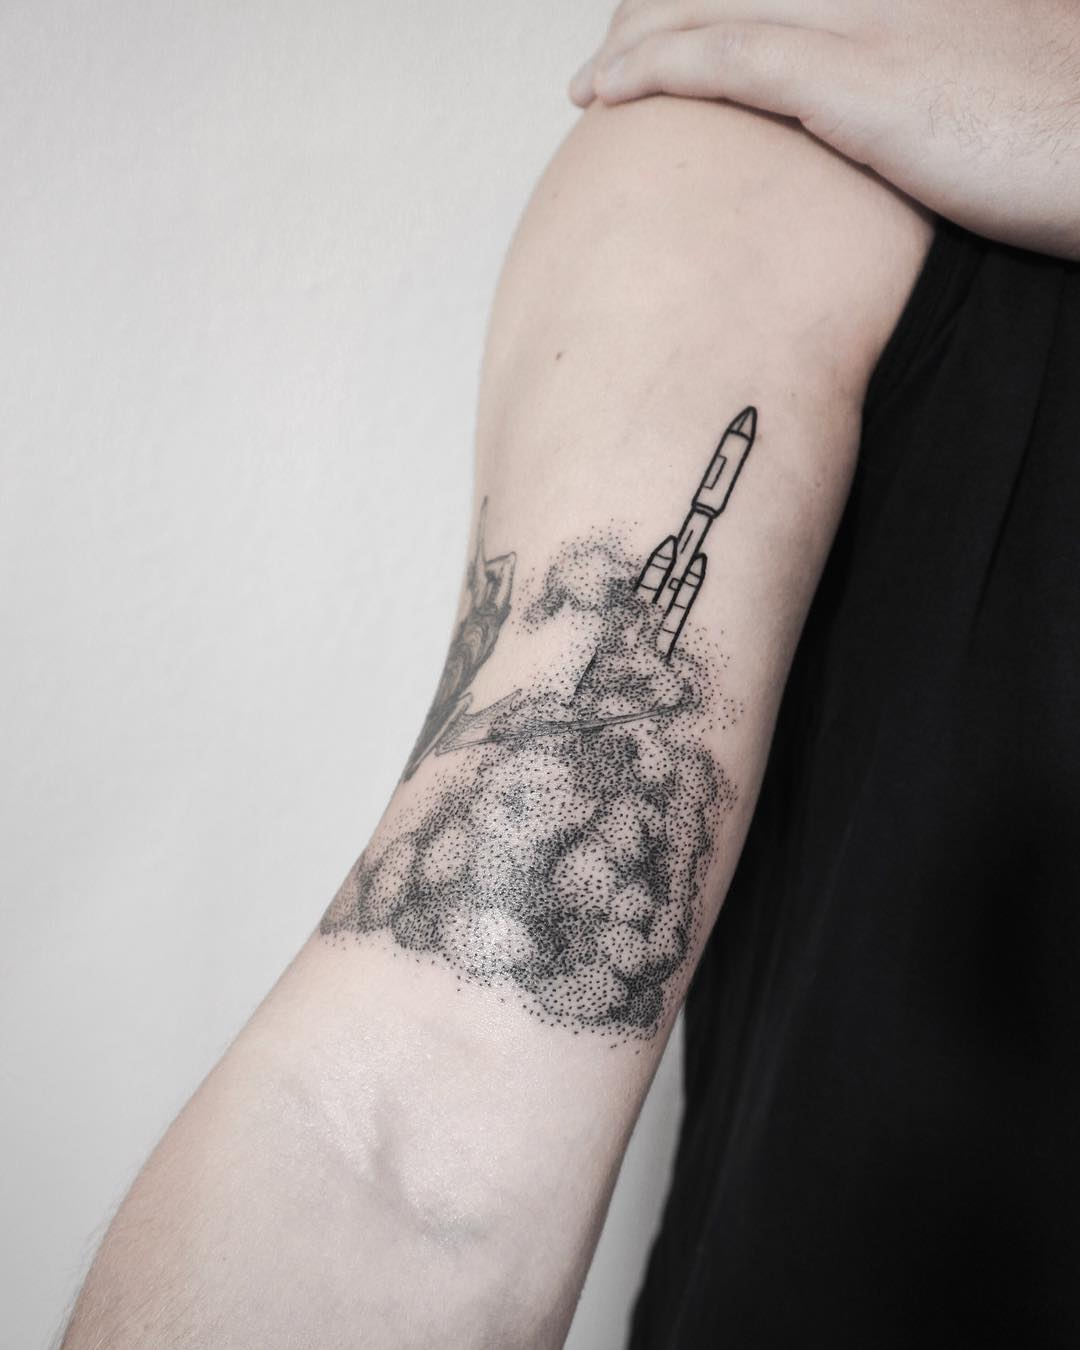 Rocket tattoo by Ann Gilberg